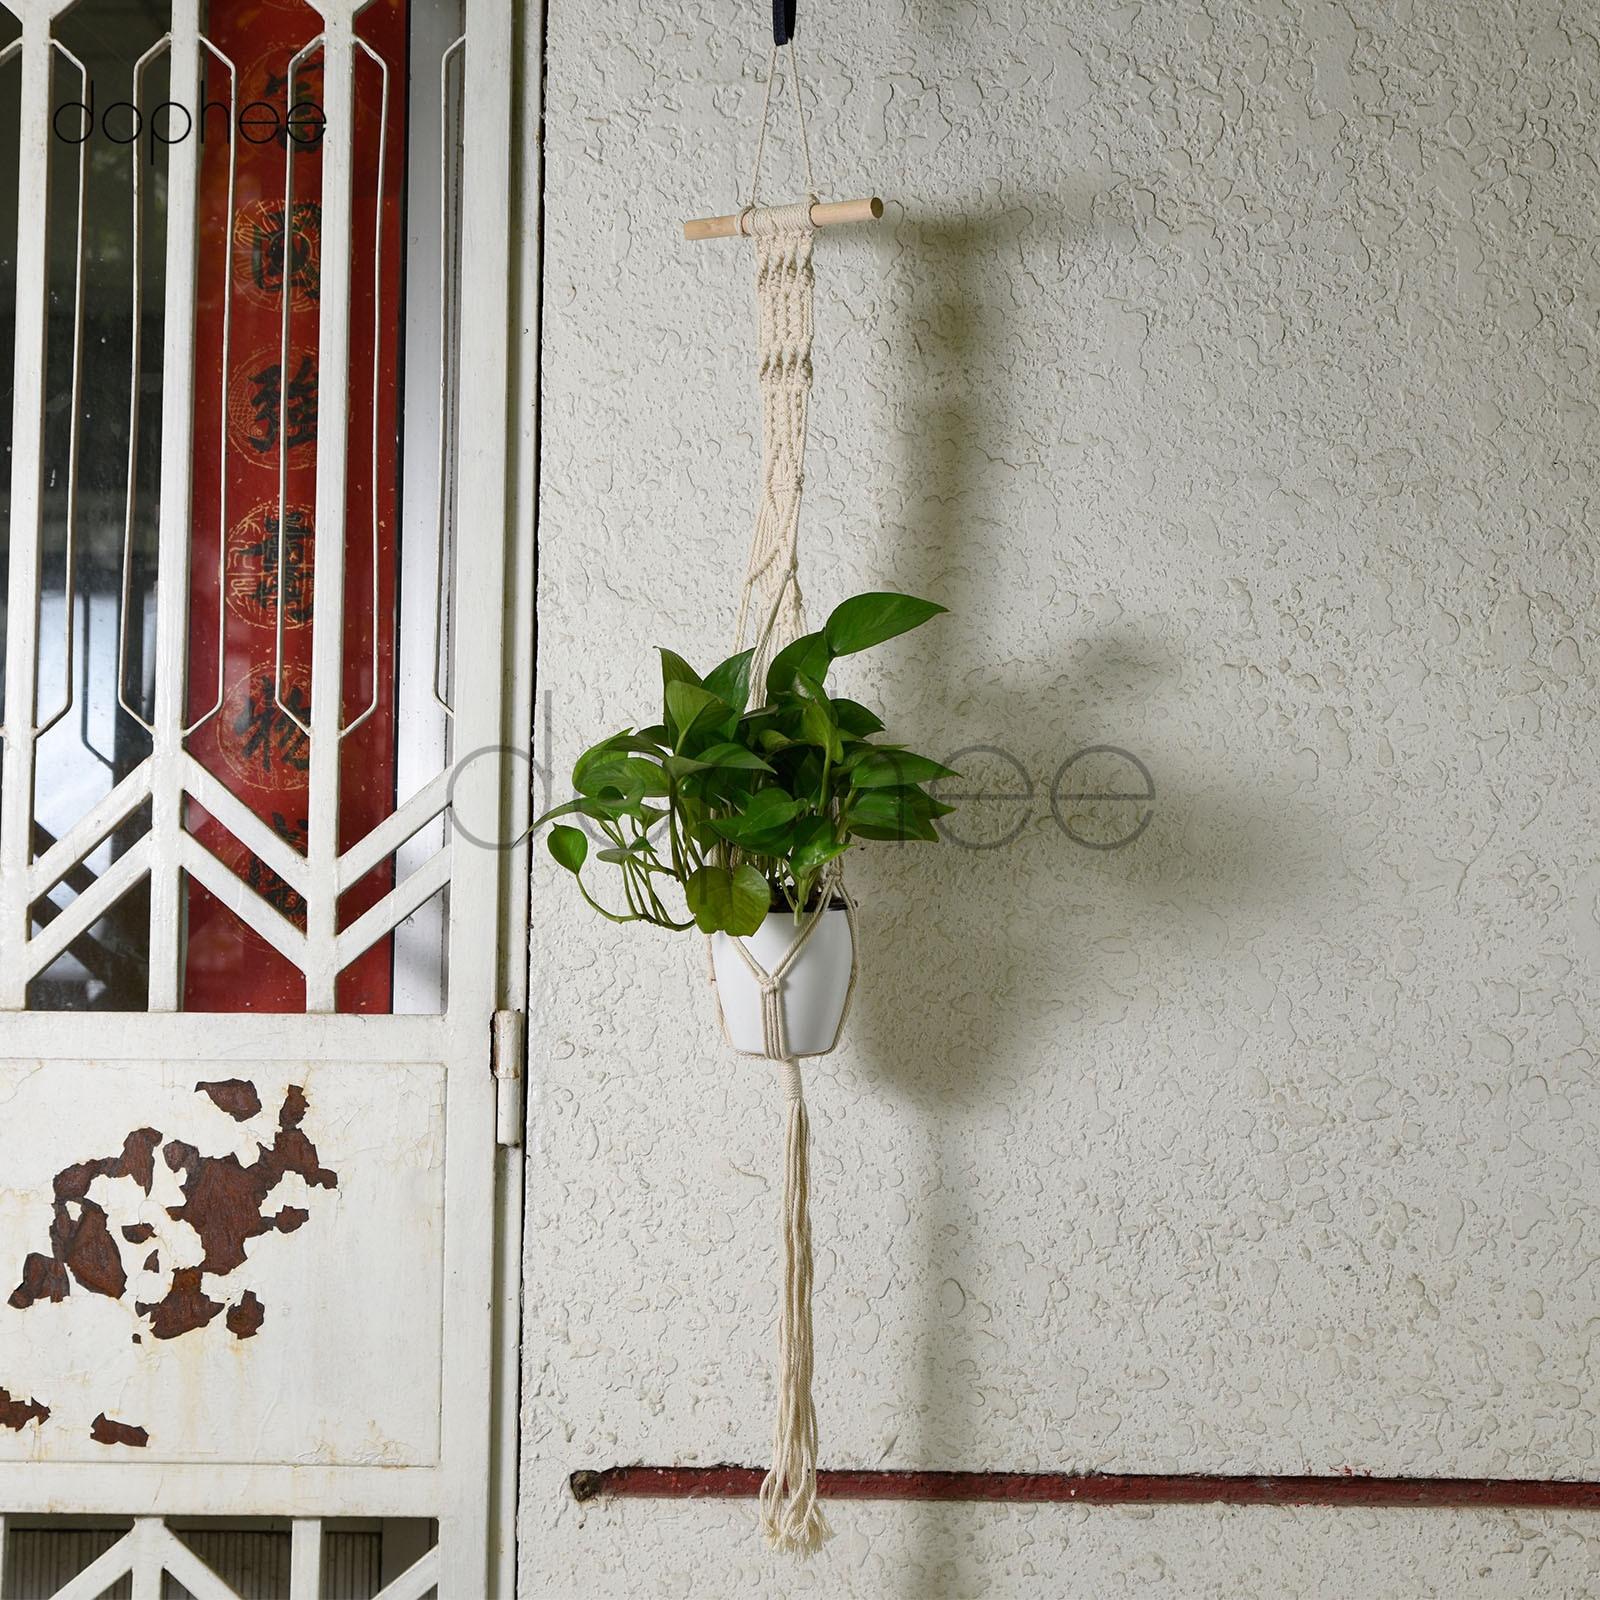 Dophee 1Pcs 100% Cotton Rope Macrame Plant Hanger Vintage Basket